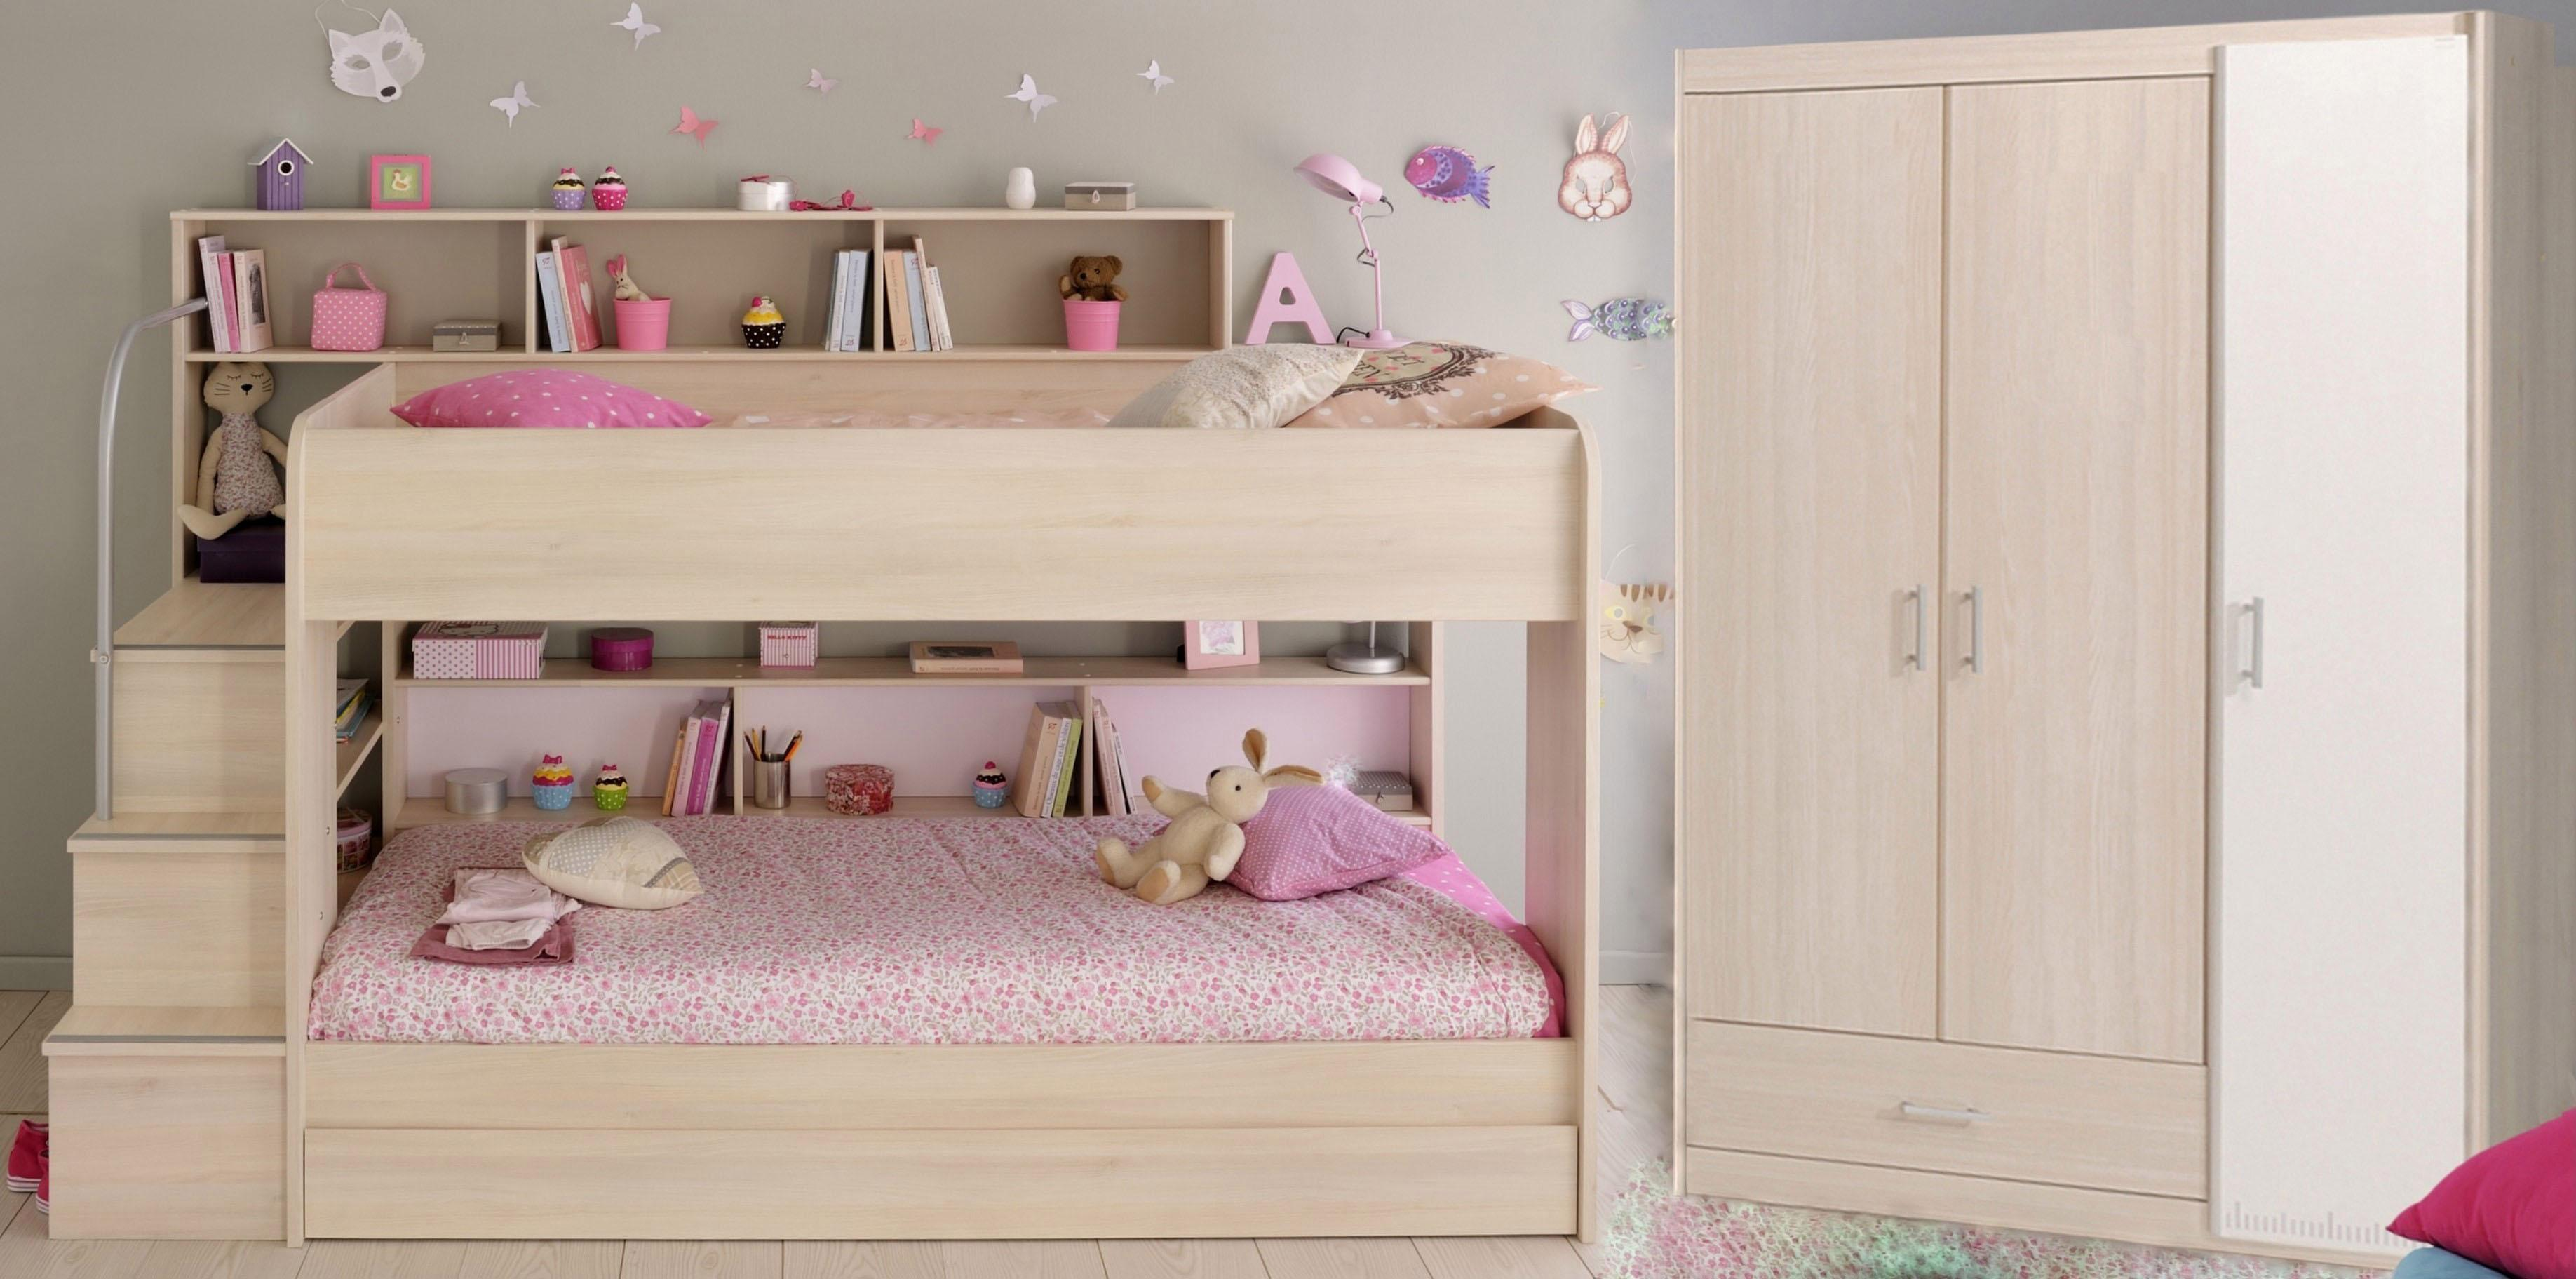 Parisot Kinderzimmer-Set »Bibop« (2-tlg.) bestellen | BAUR